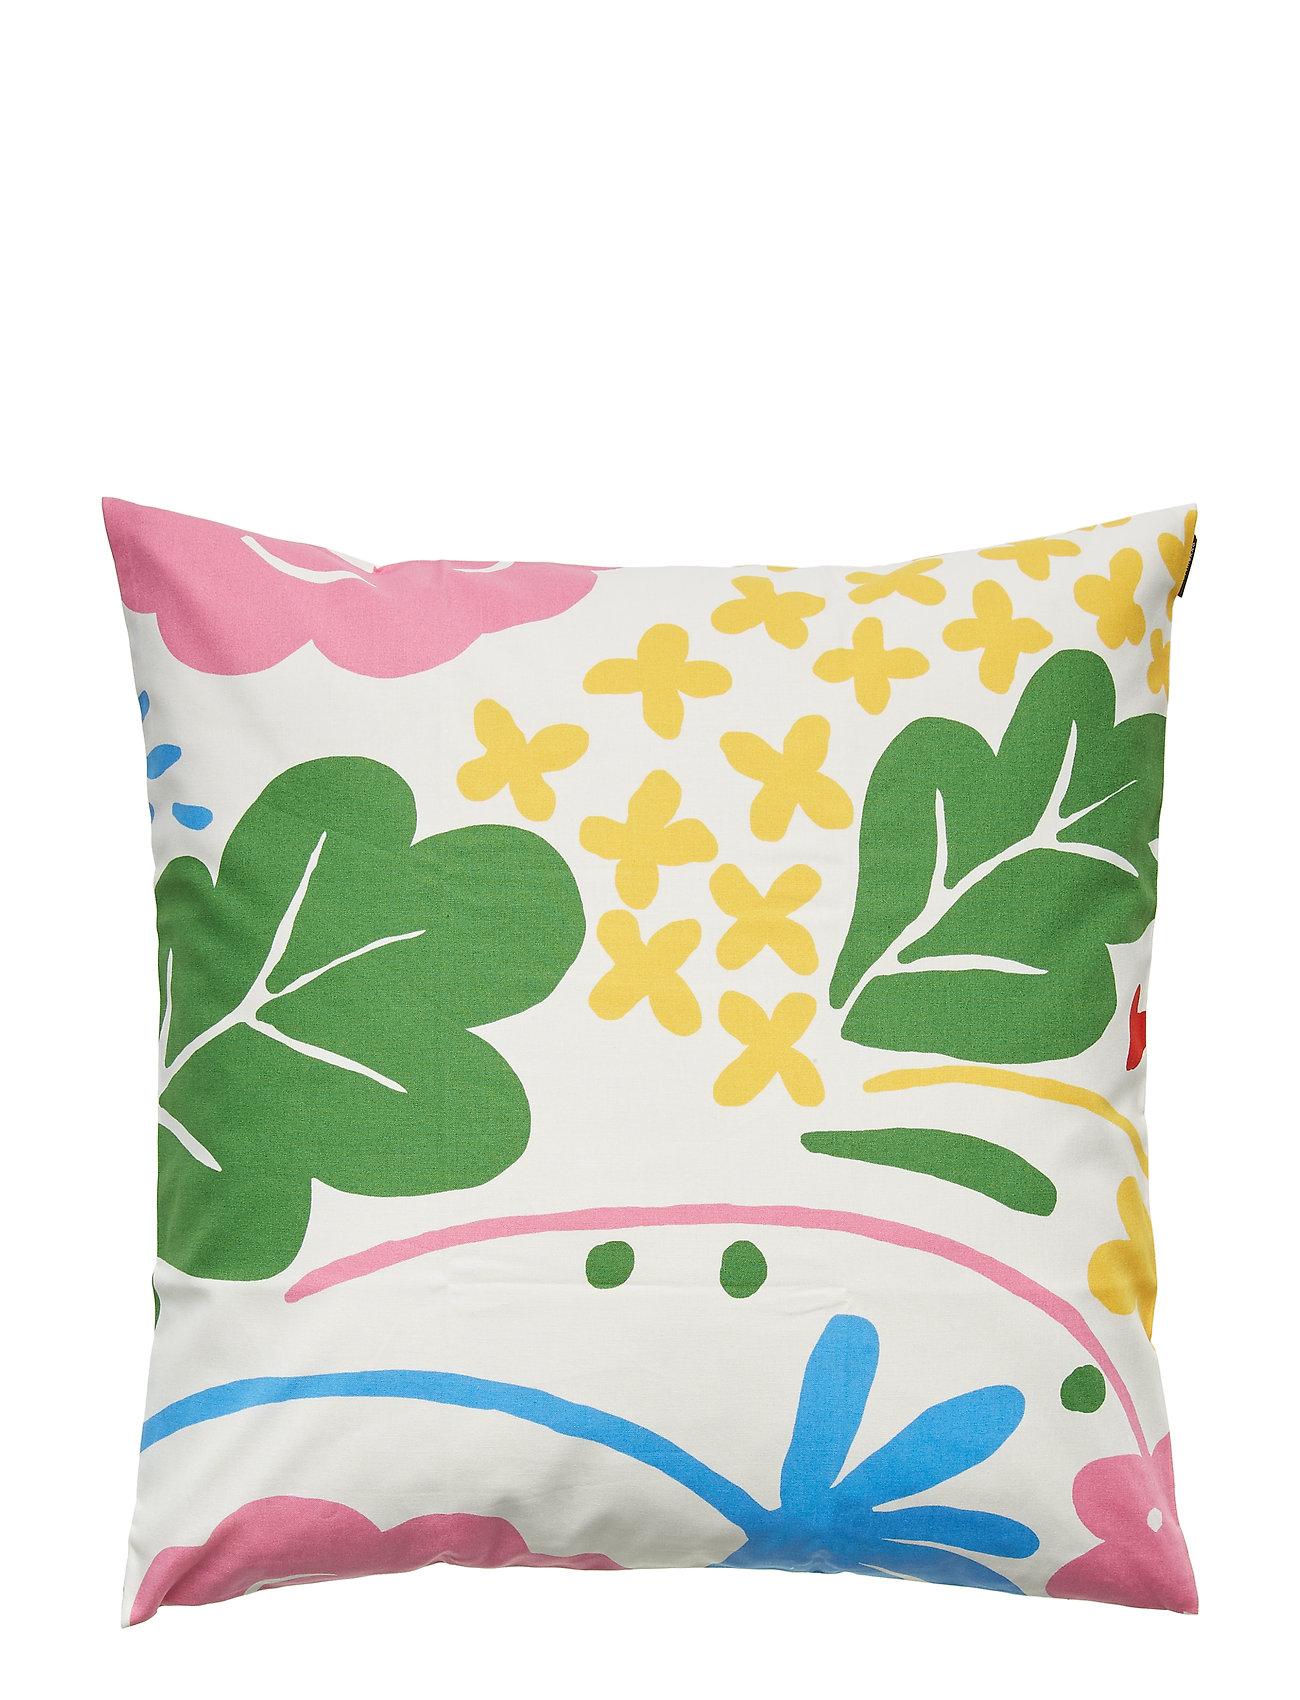 Home Cushion CoverwhiteMulticolorMarimekko Onni CoverwhiteMulticolorMarimekko Home Cushion Onni NkZwP0OX8n